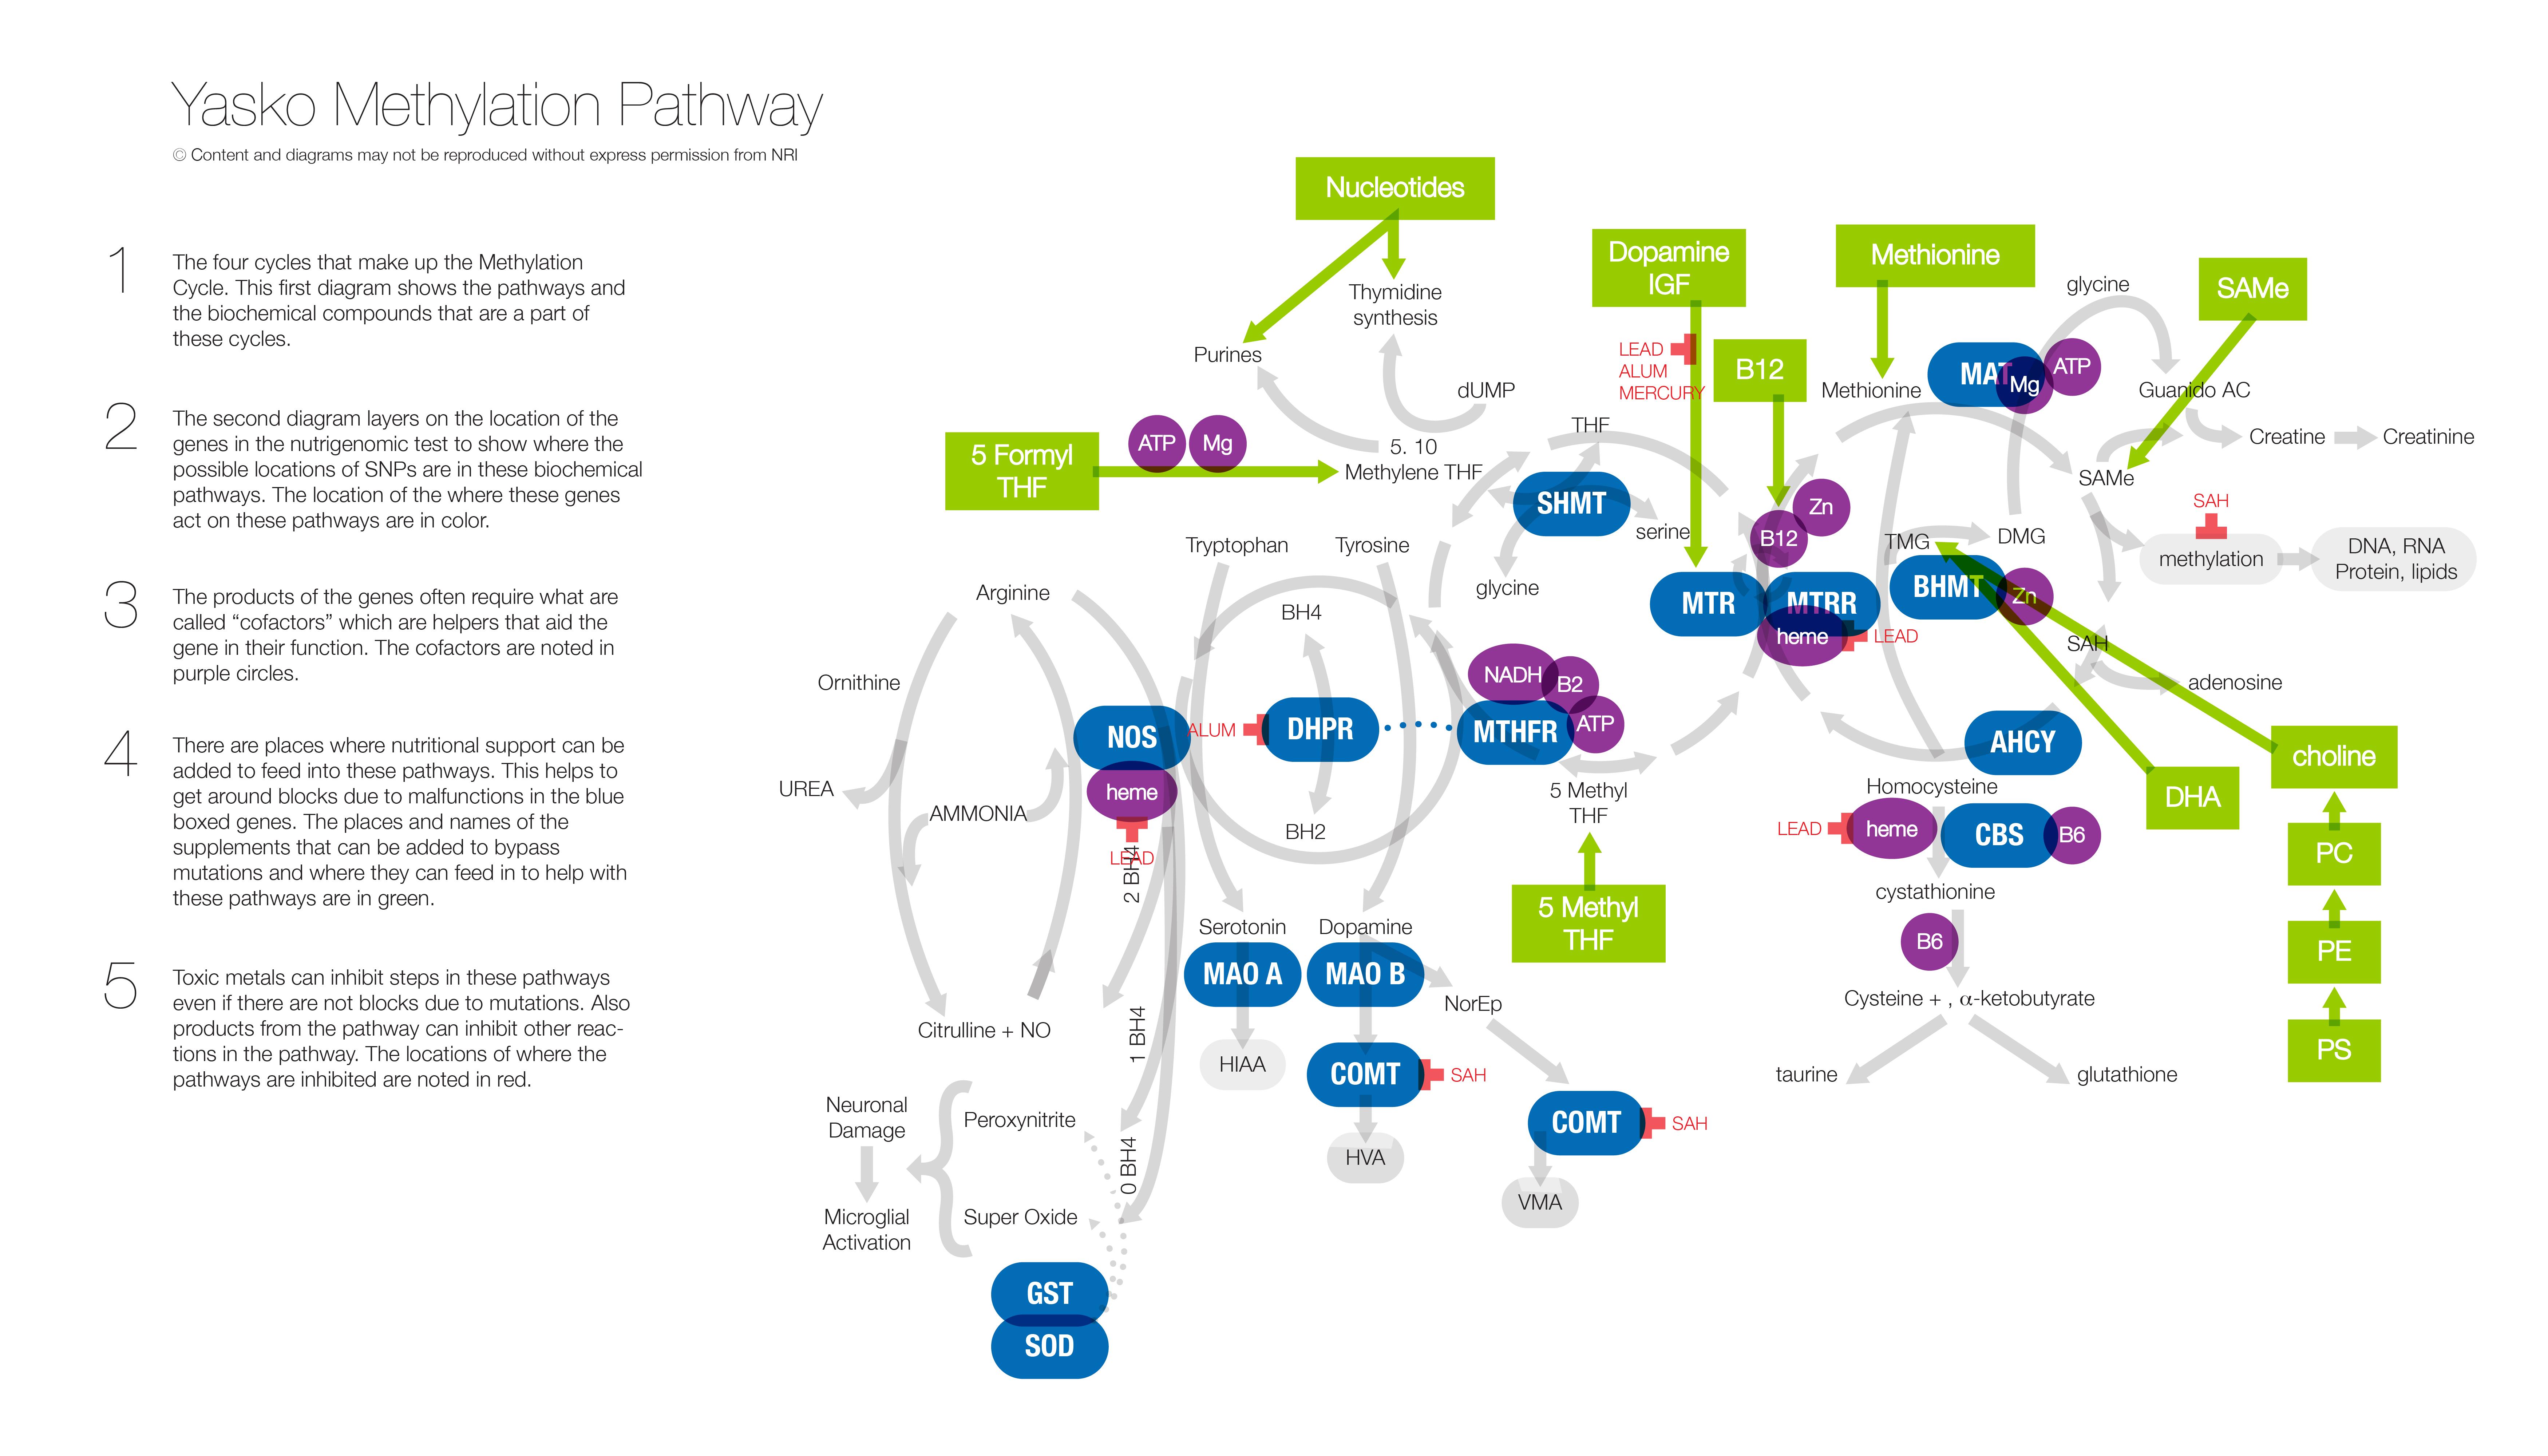 Yasko Methylation Pathway - 5